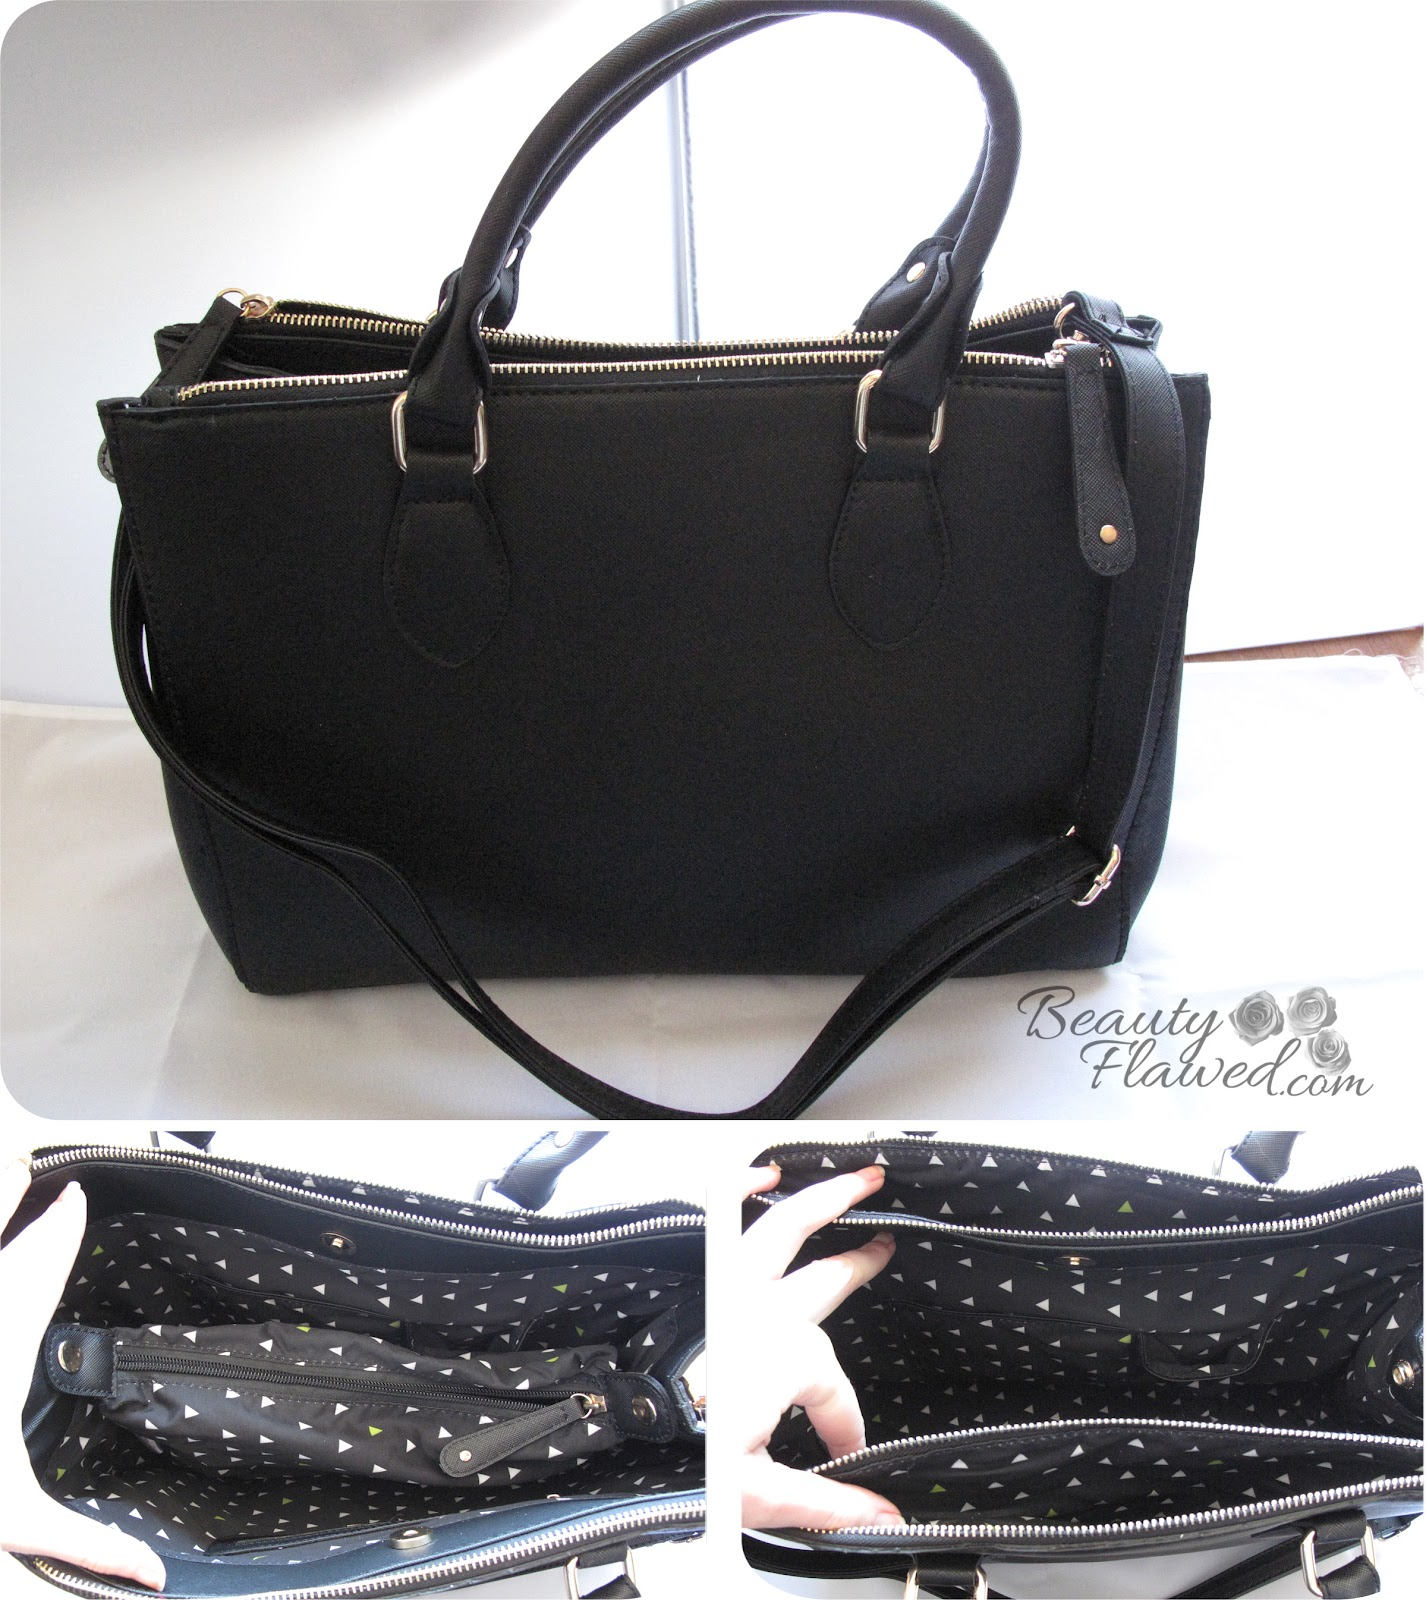 September 2012 Little Black Bag | Beauty Flawed